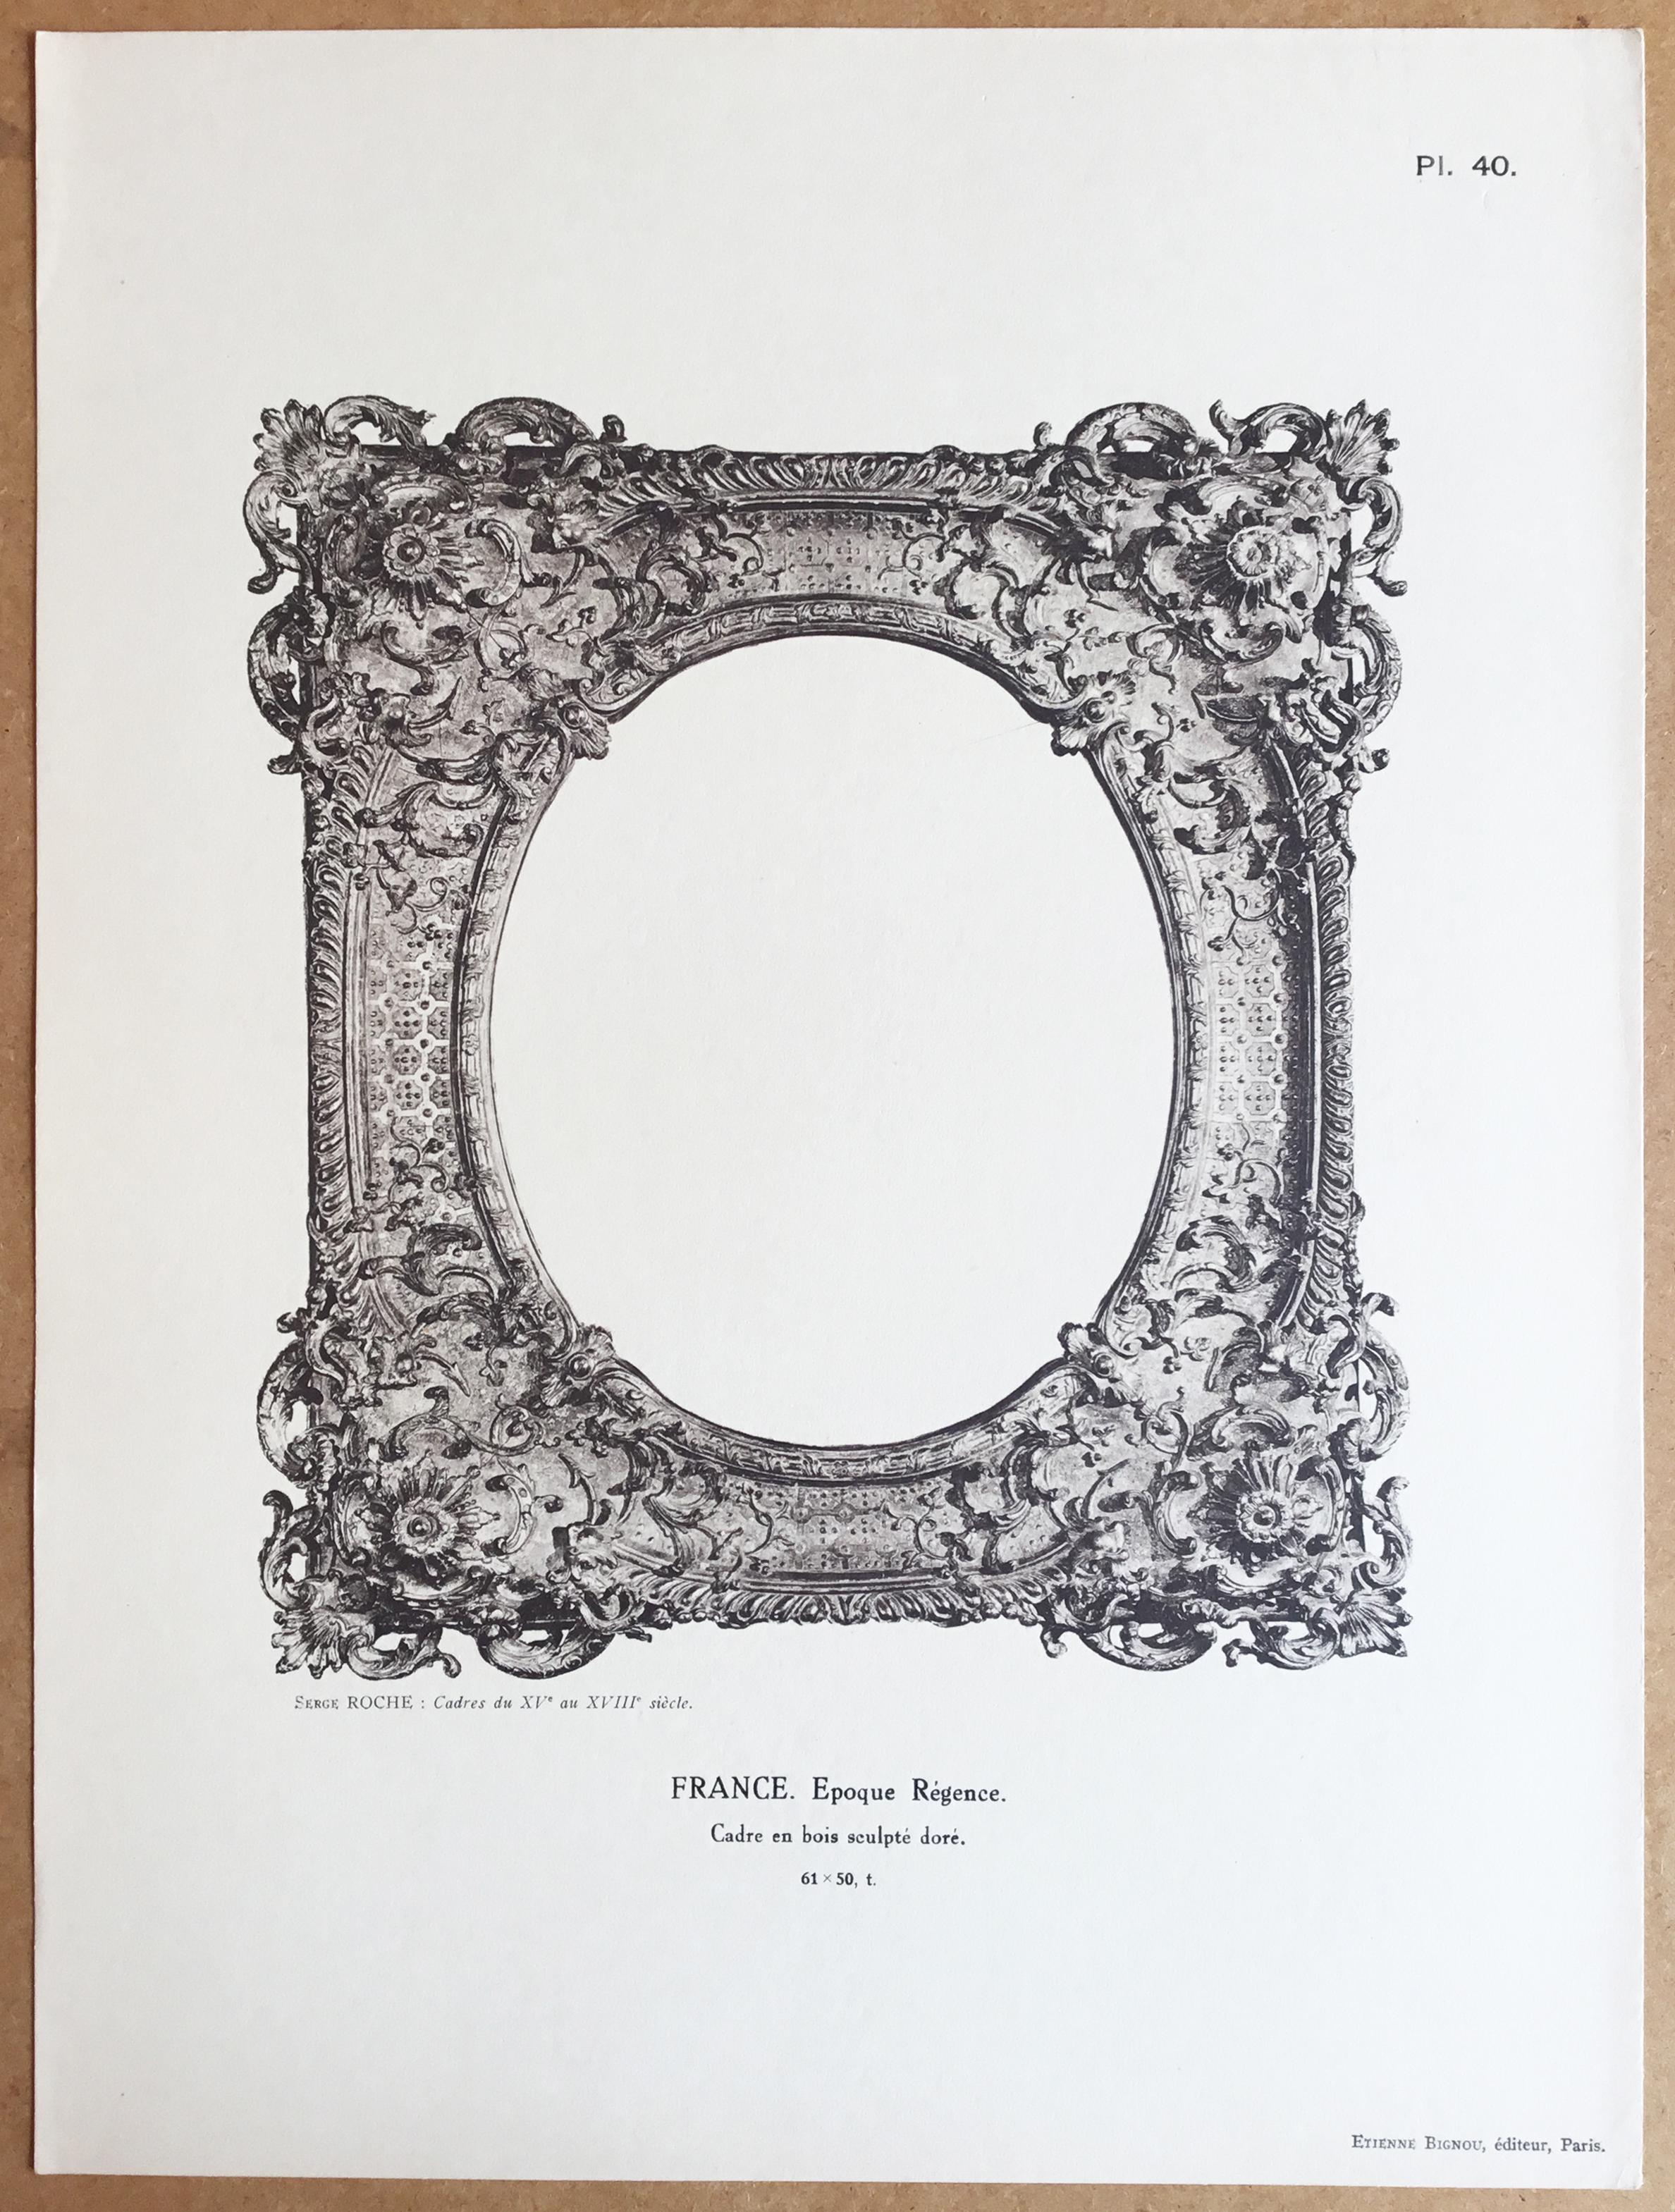 12 Plate 40